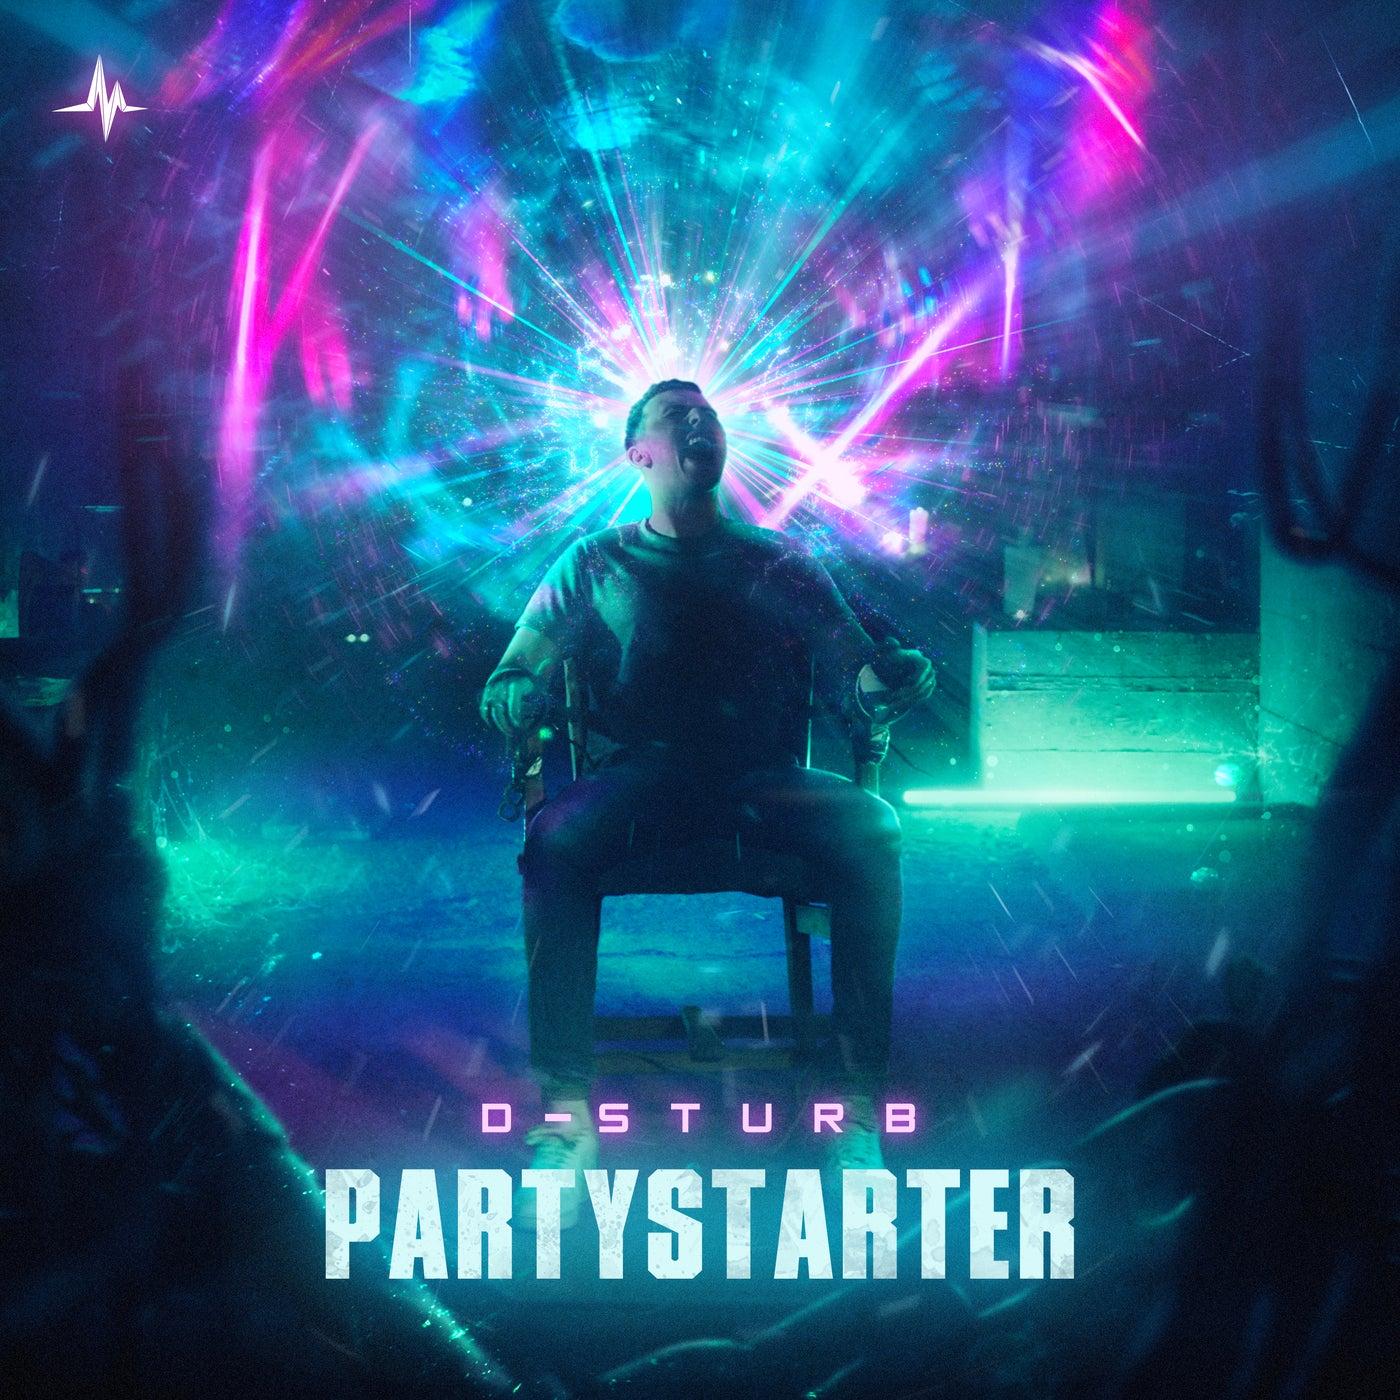 Partystarter (Original Mix)